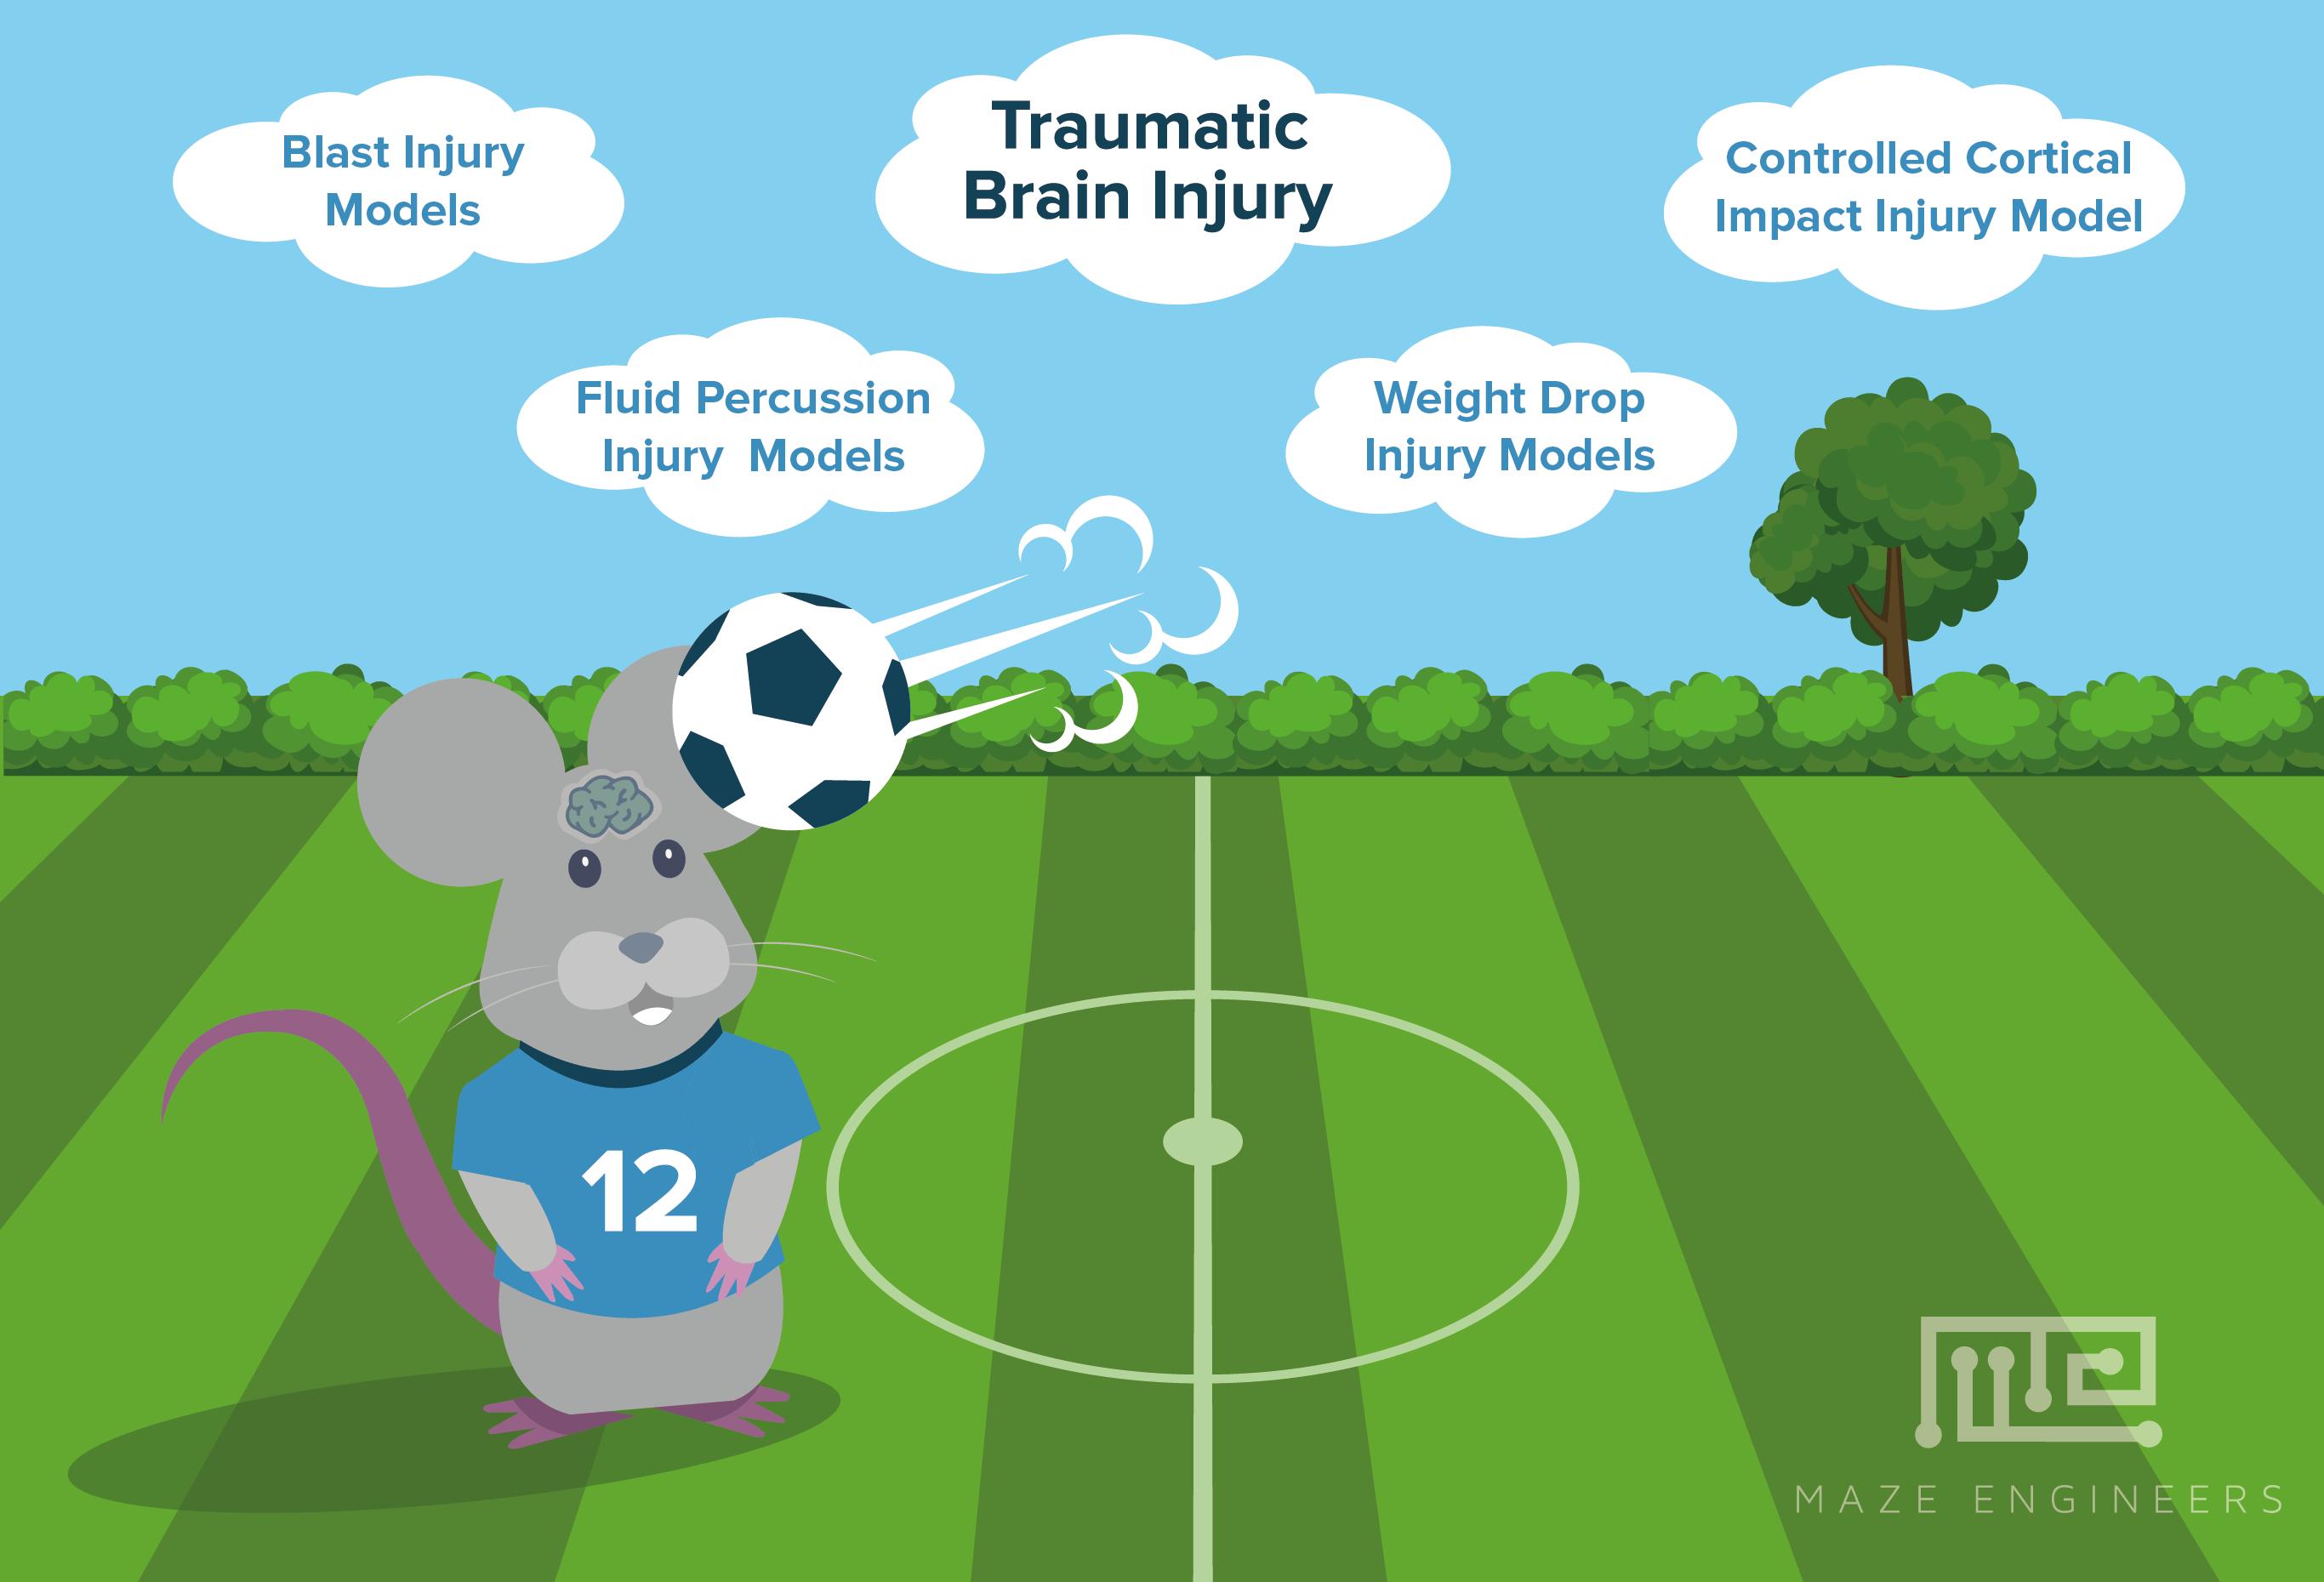 Animal Models of Traumatic Brain Injury